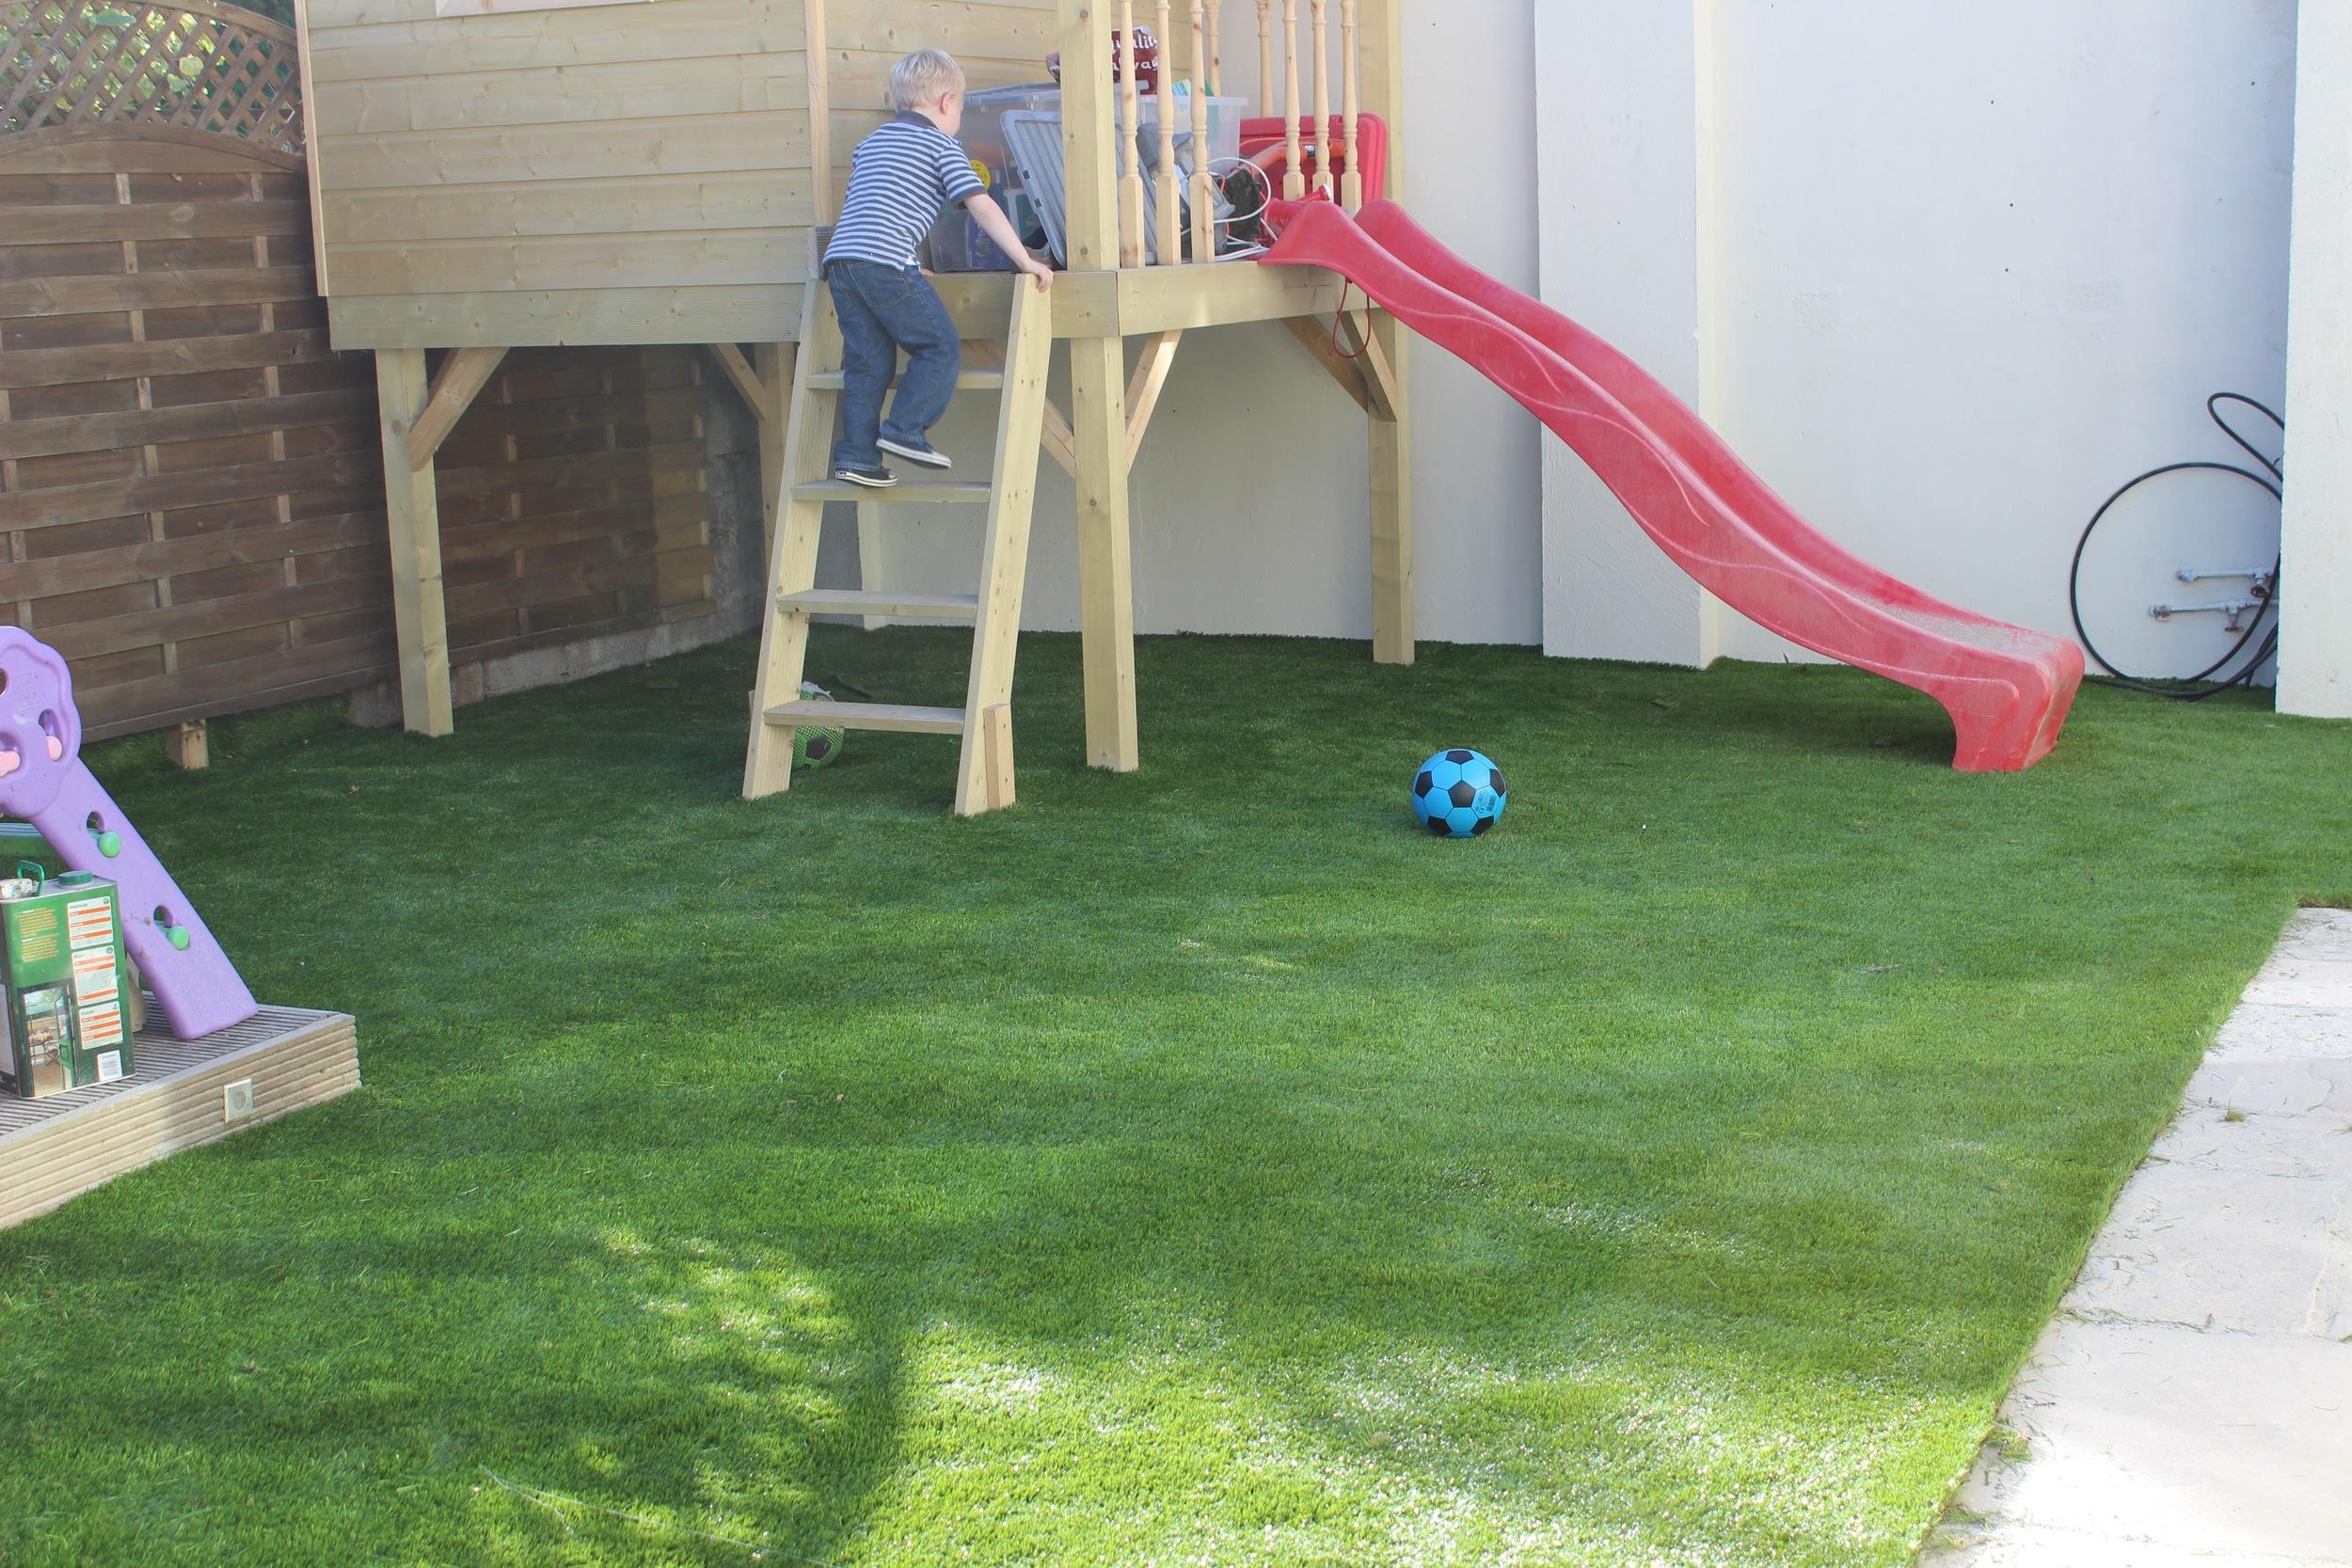 TigerTurf artificial astroturf lawn in Dublin Family garden